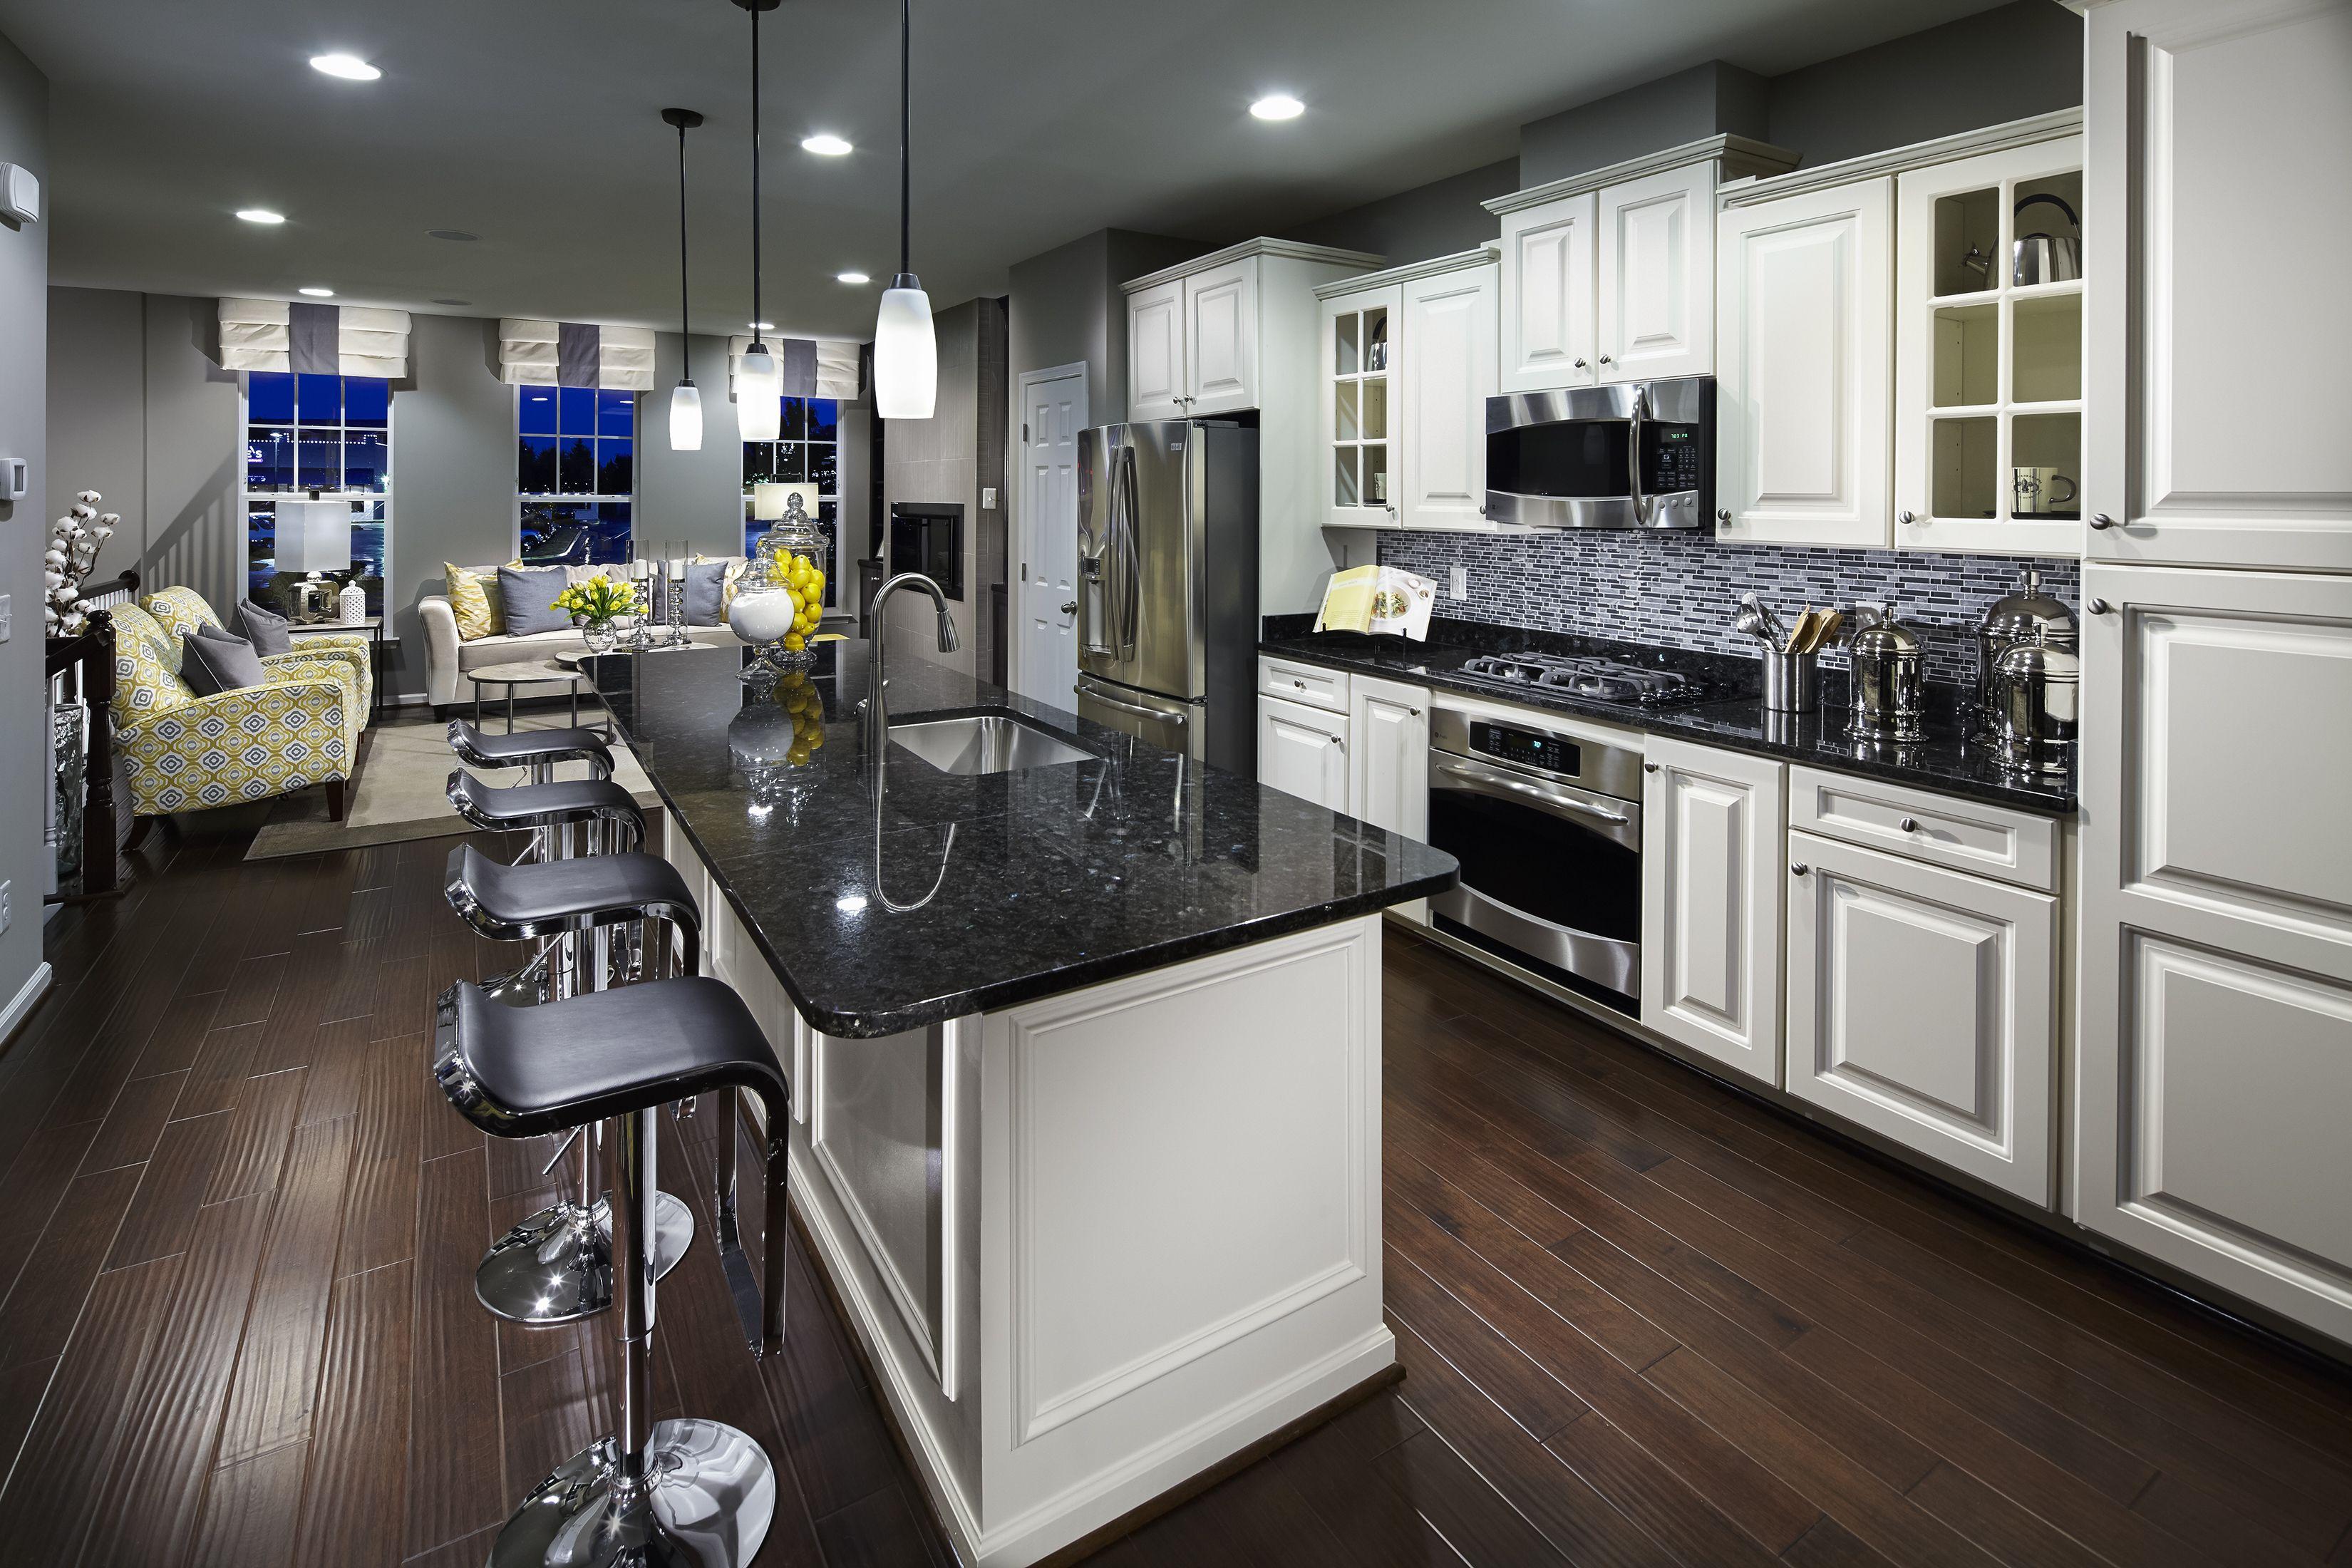 Enjoyable Kennedy Model Manassas Park Va Ryland Homes Northern Interior Design Ideas Clesiryabchikinfo